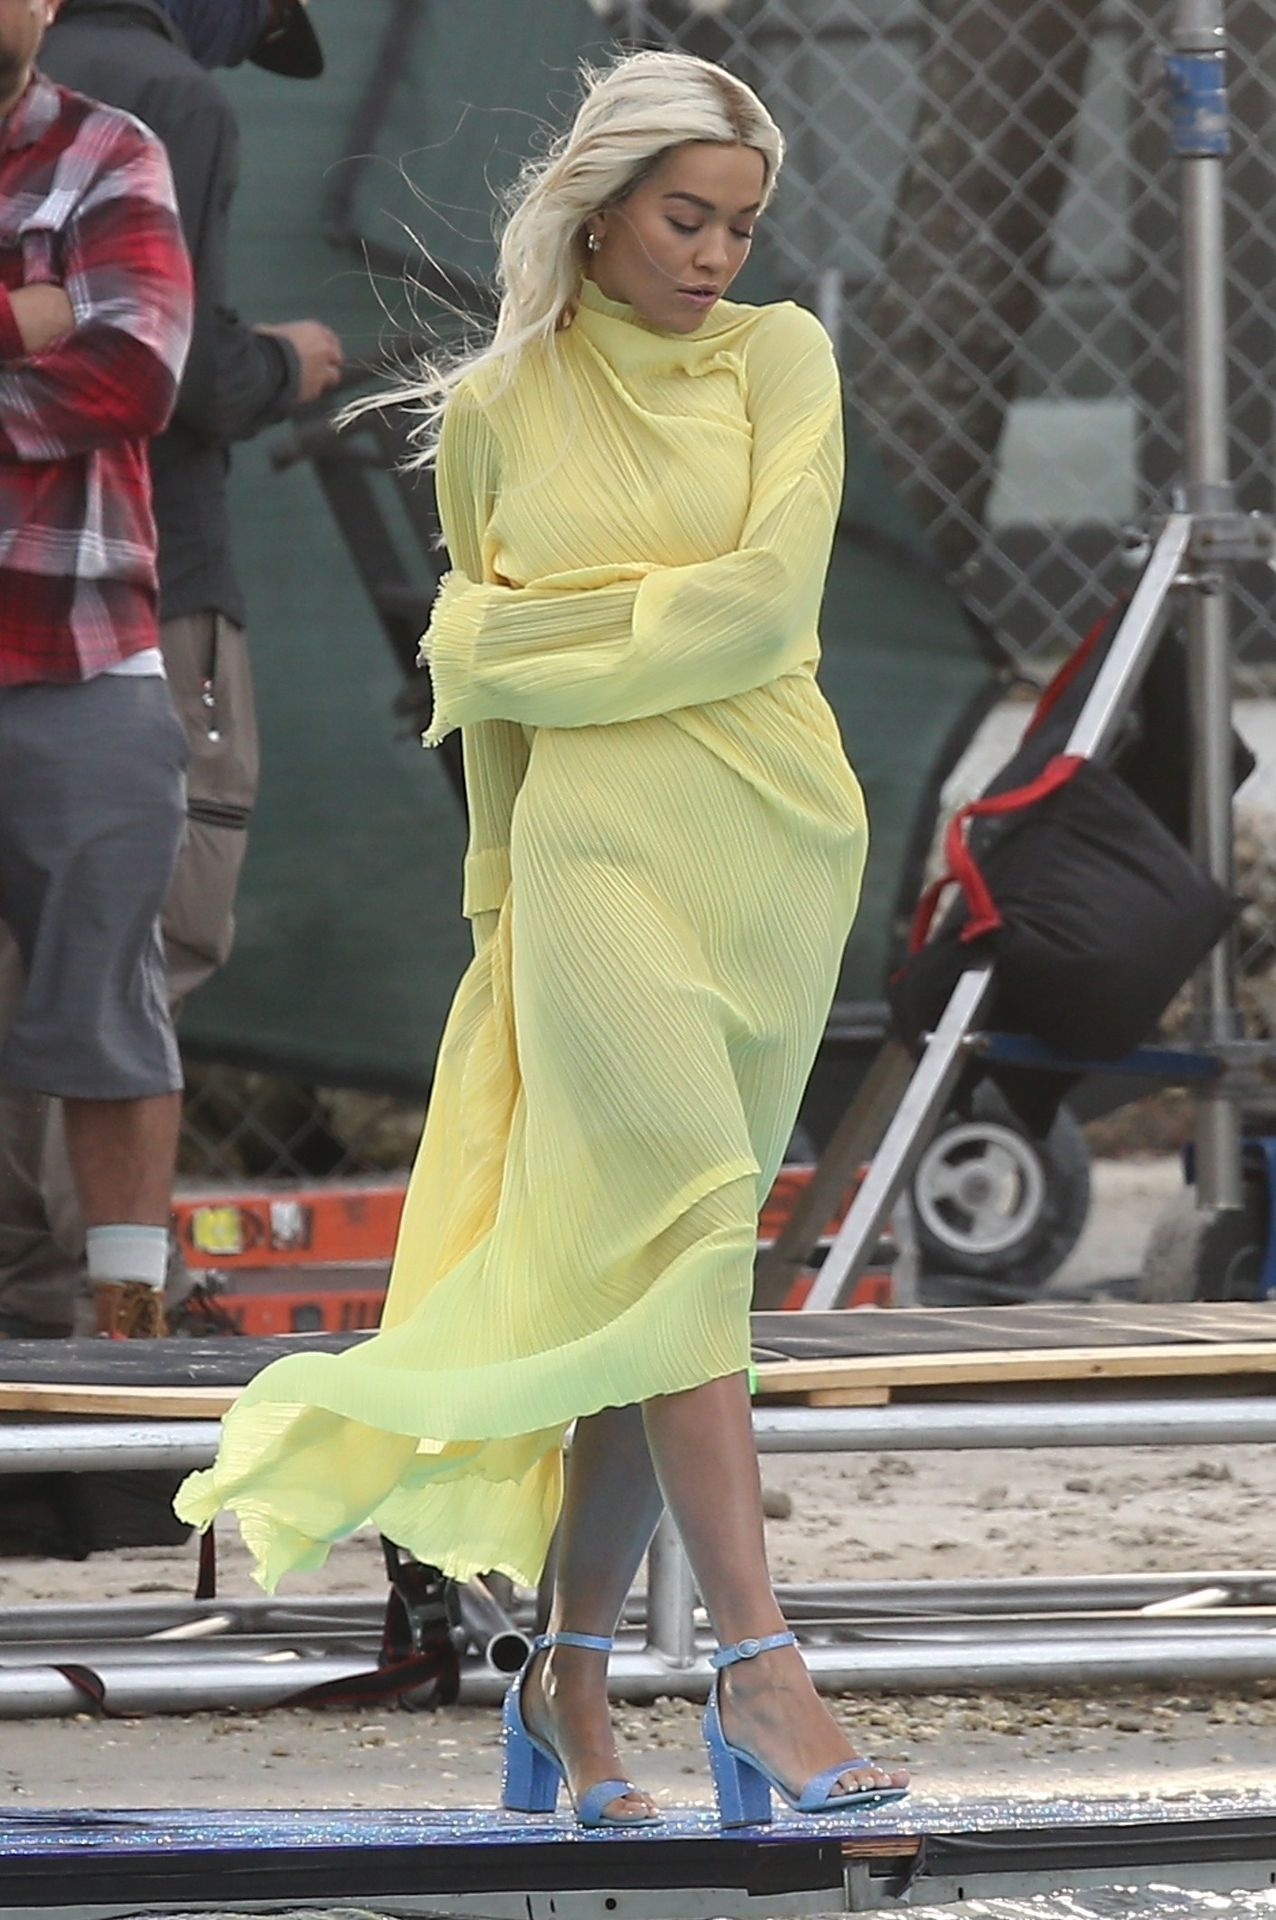 Rita Ora Upskirt 0017